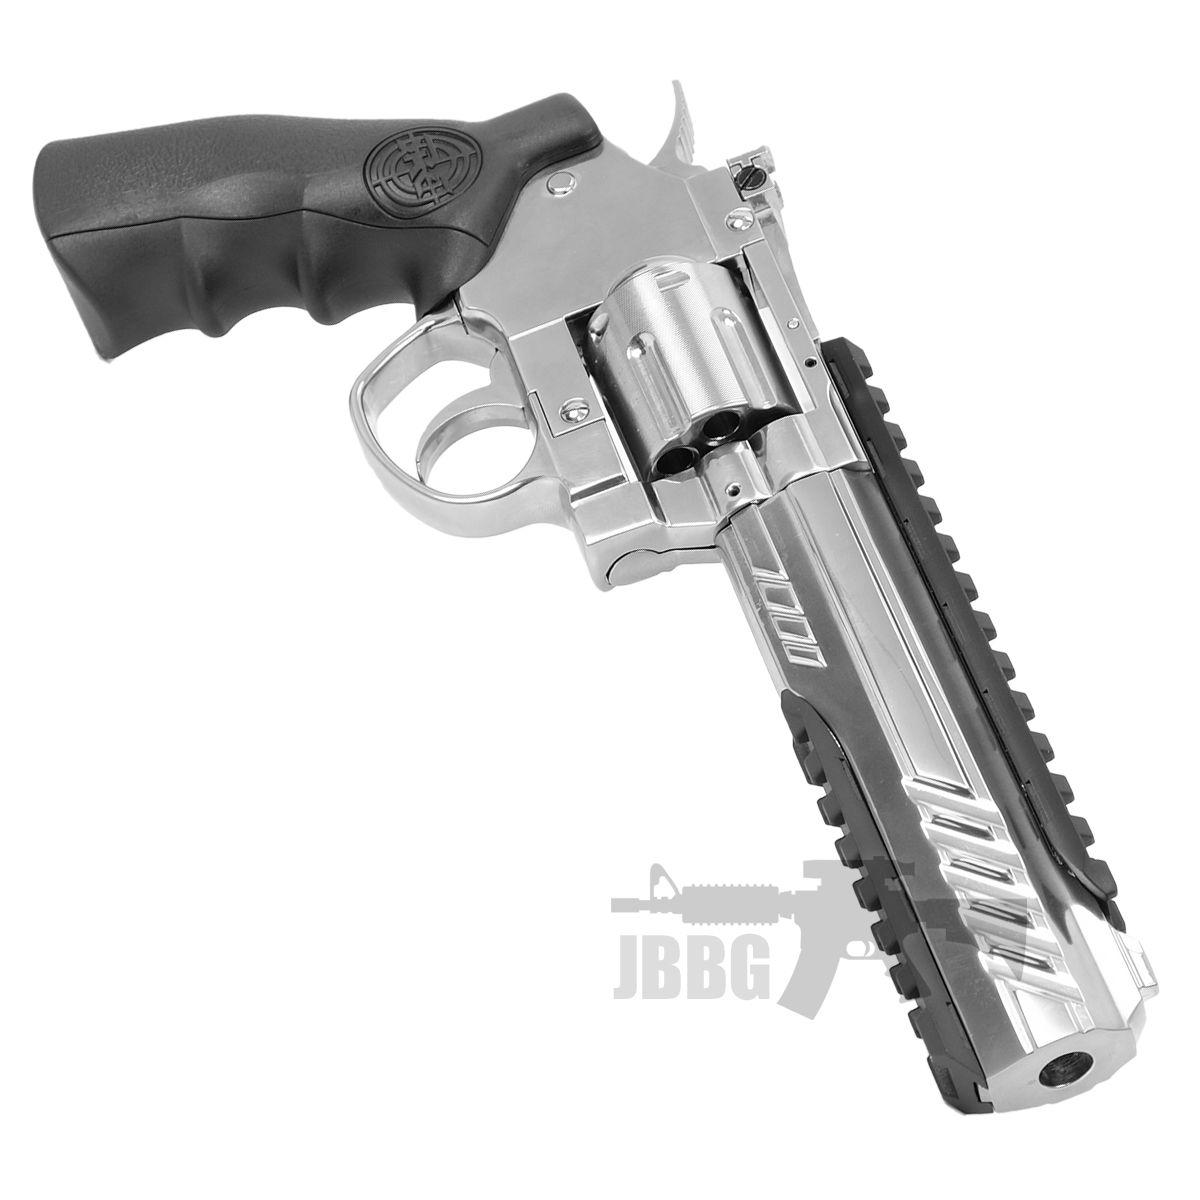 SRC 6 Inch Titan Platinum Ver CO2 Airsoft Revolver 33